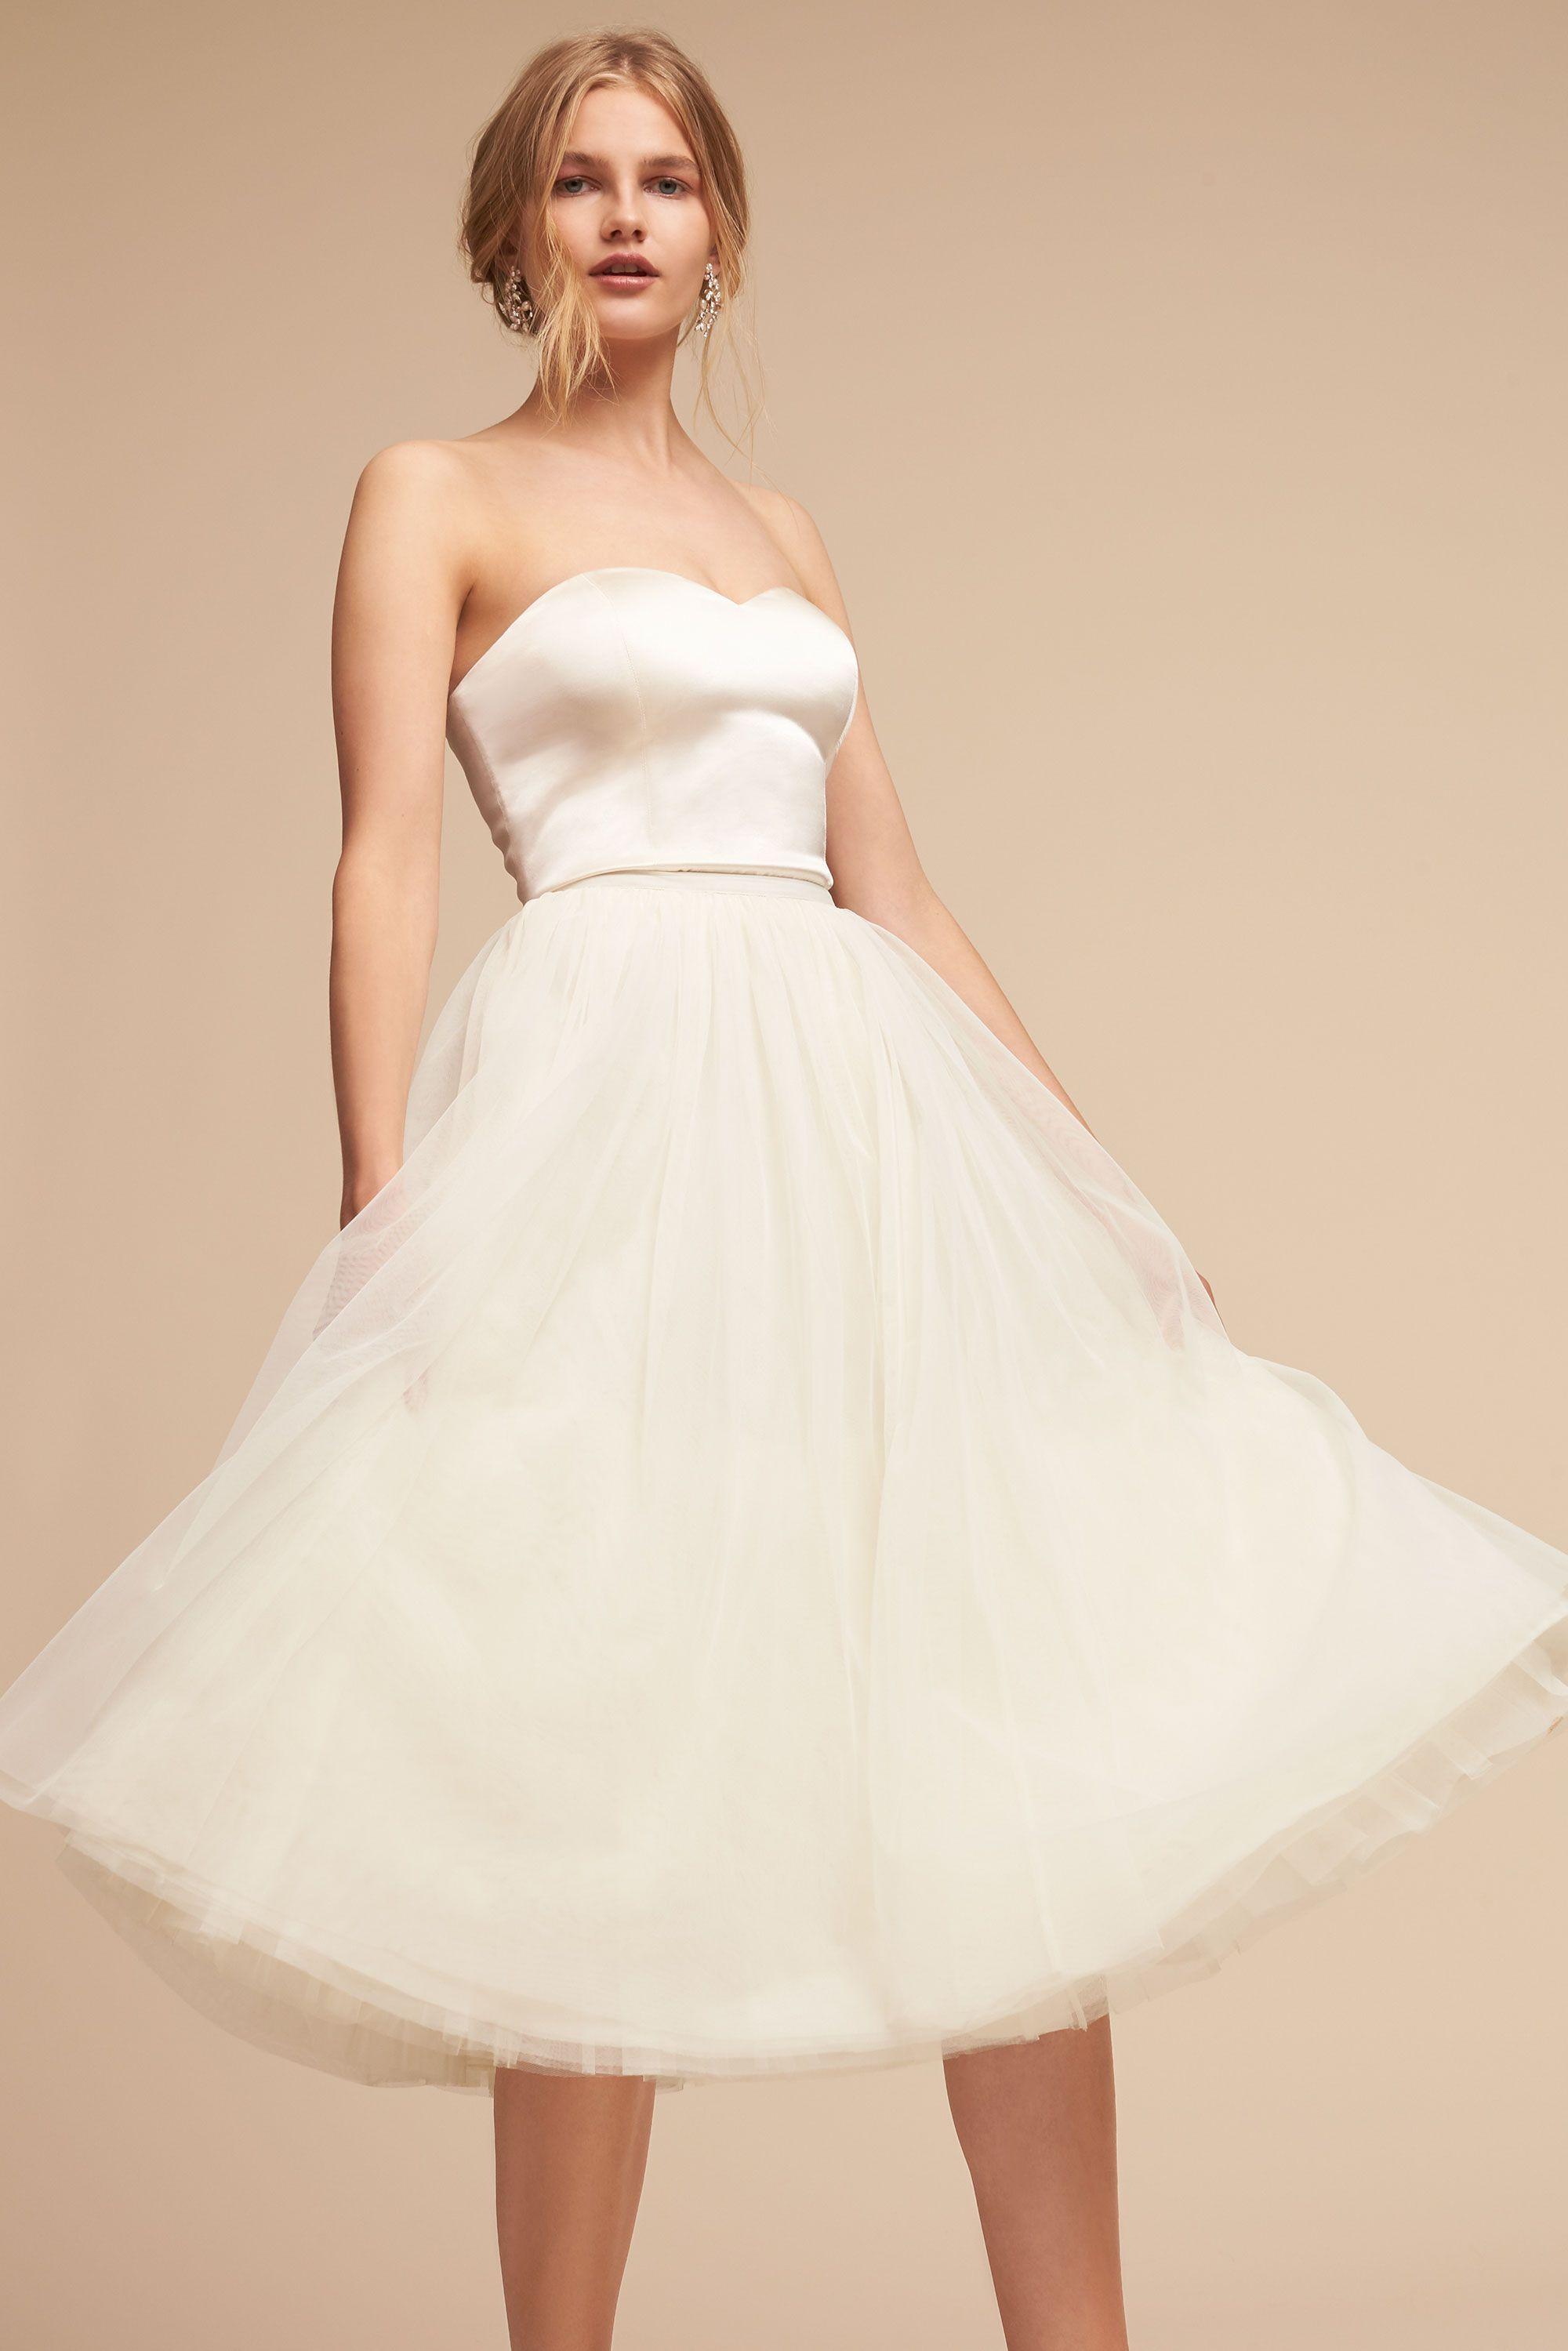 Darla camisole top u marcie skirt from bhldn wedding dresses